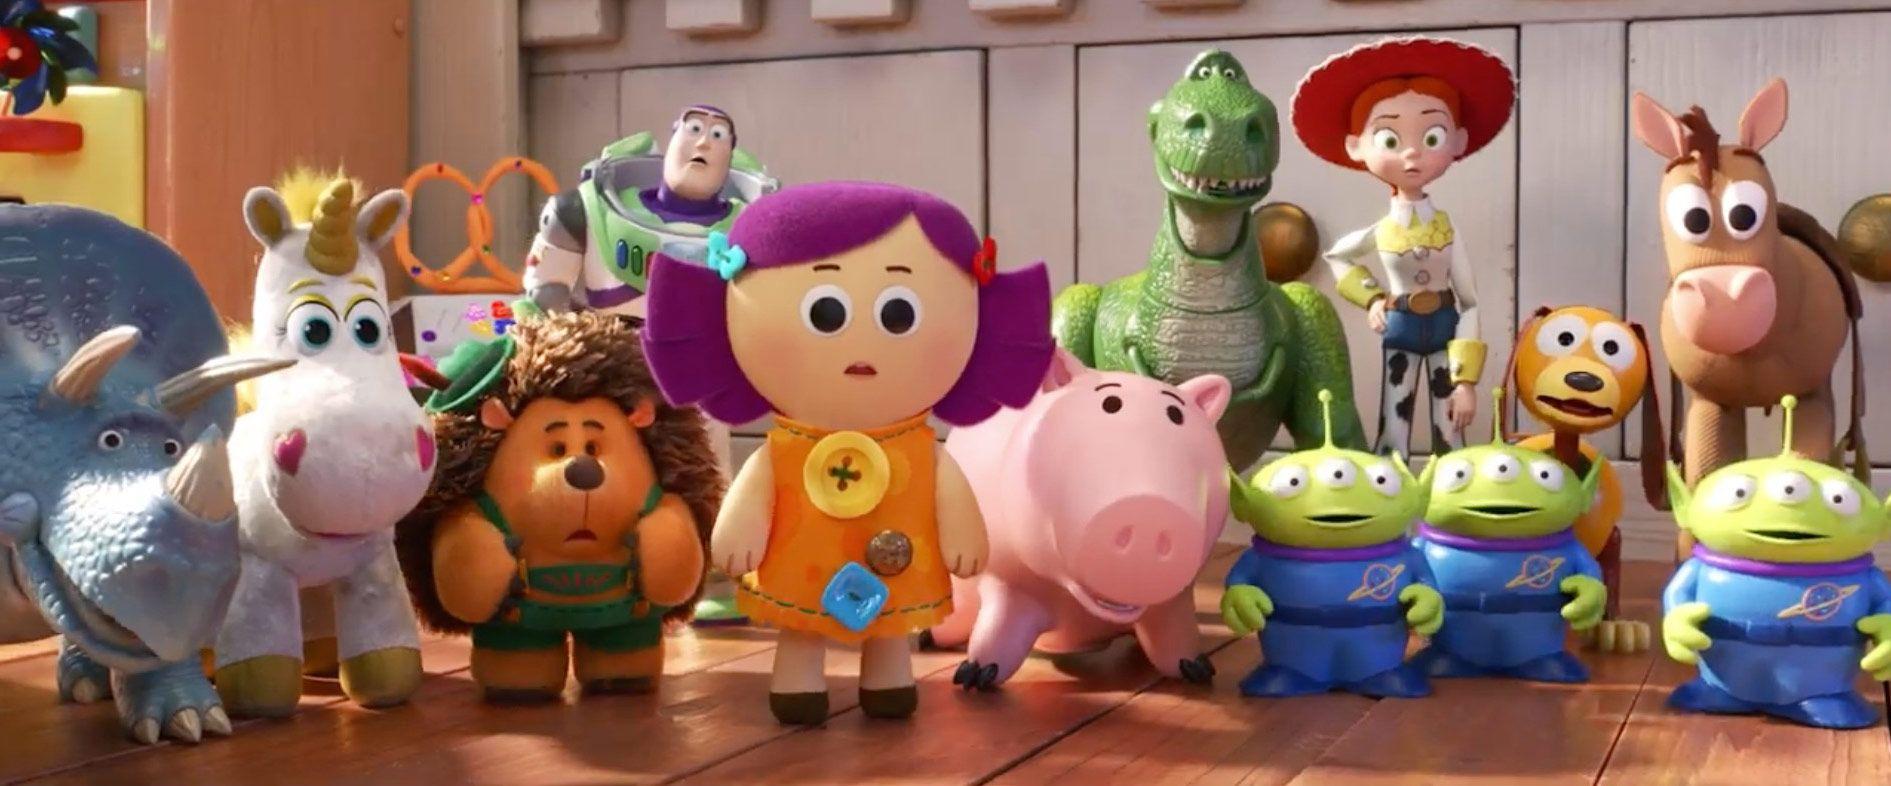 Animation film list 2020